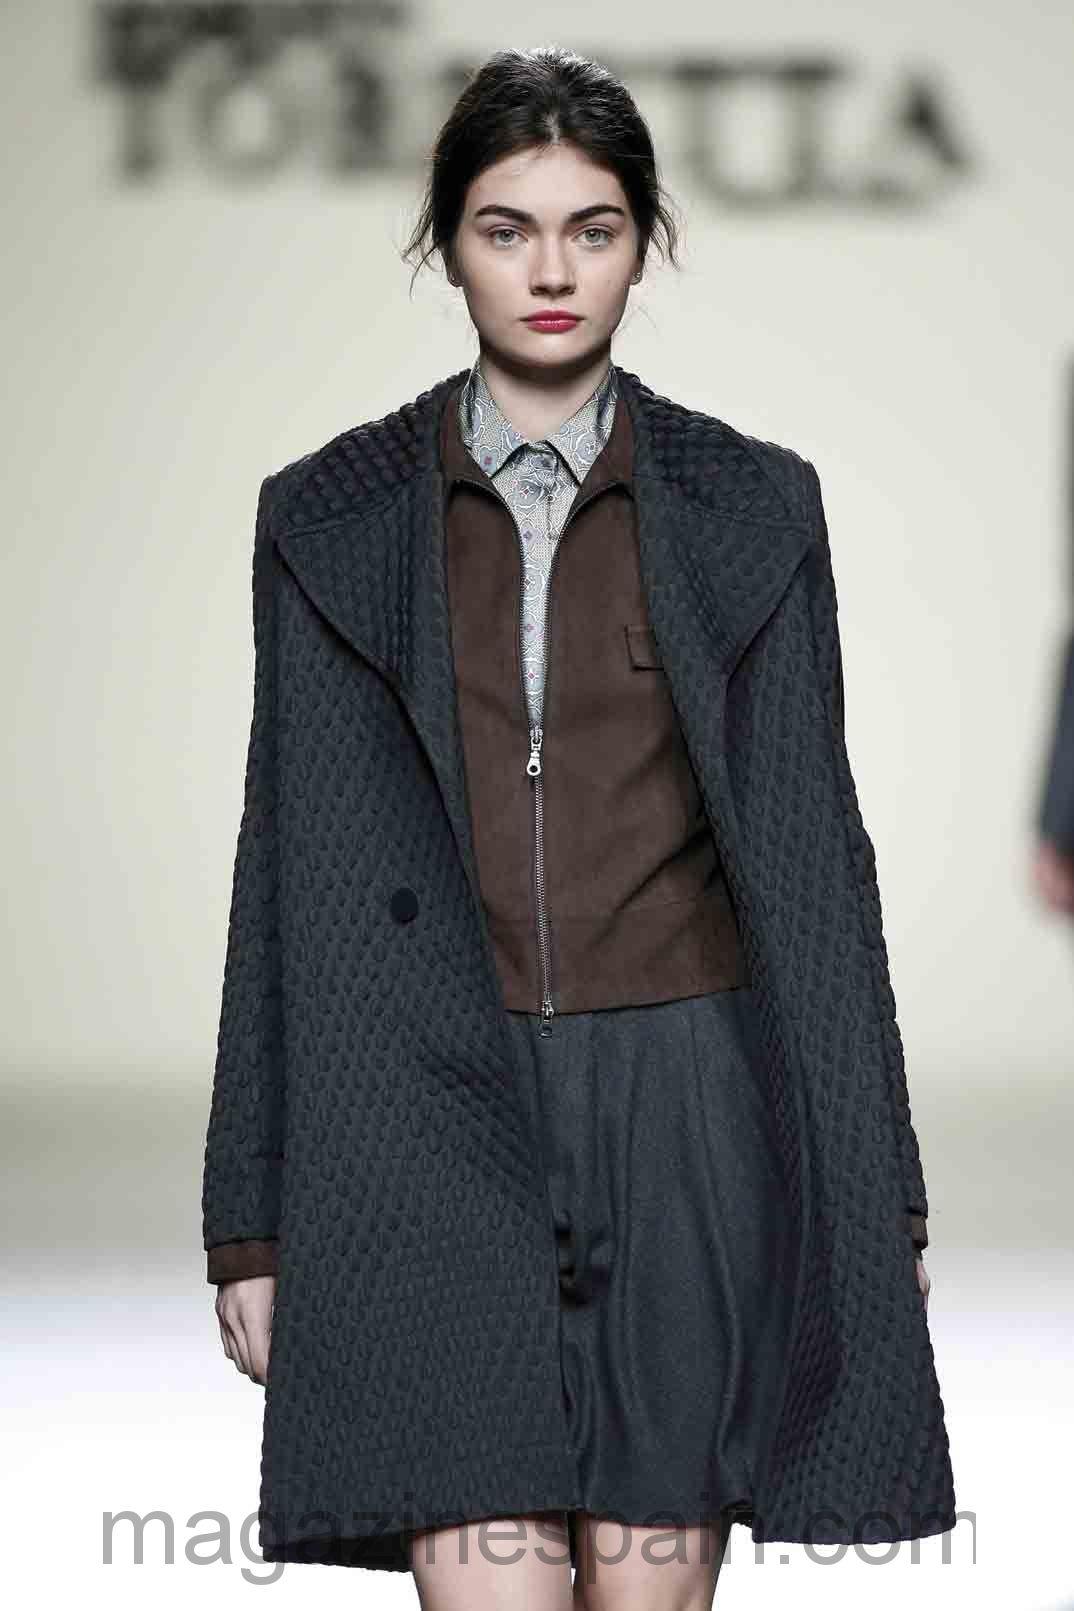 Ellas Week Torretta Madrid Benz Moda Roberto Mercedes Fashion FZqfPzn0